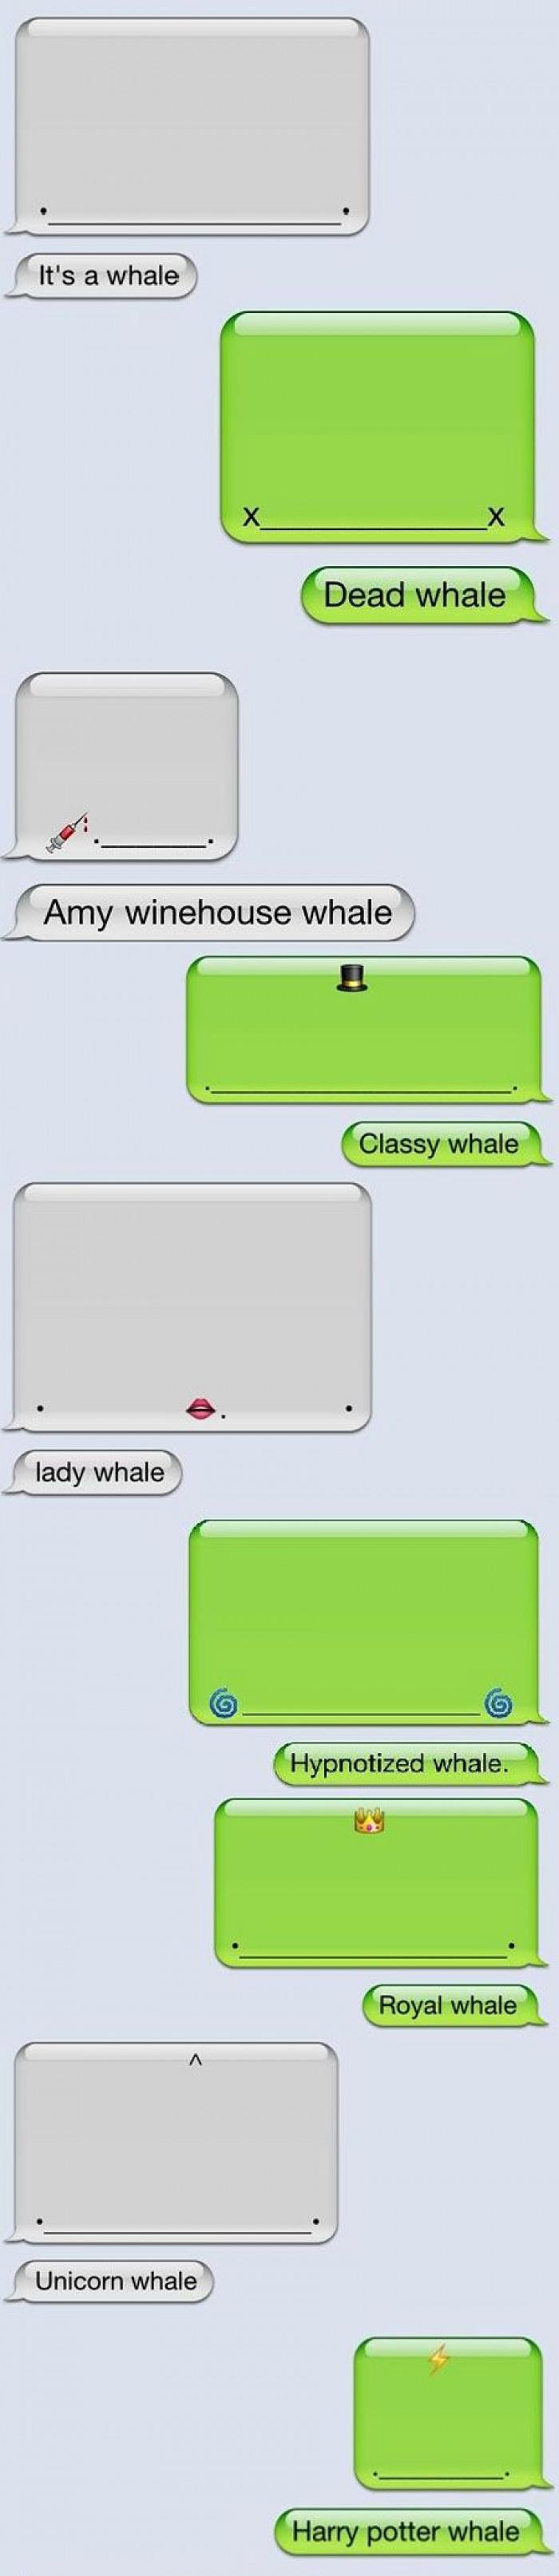 Much whale